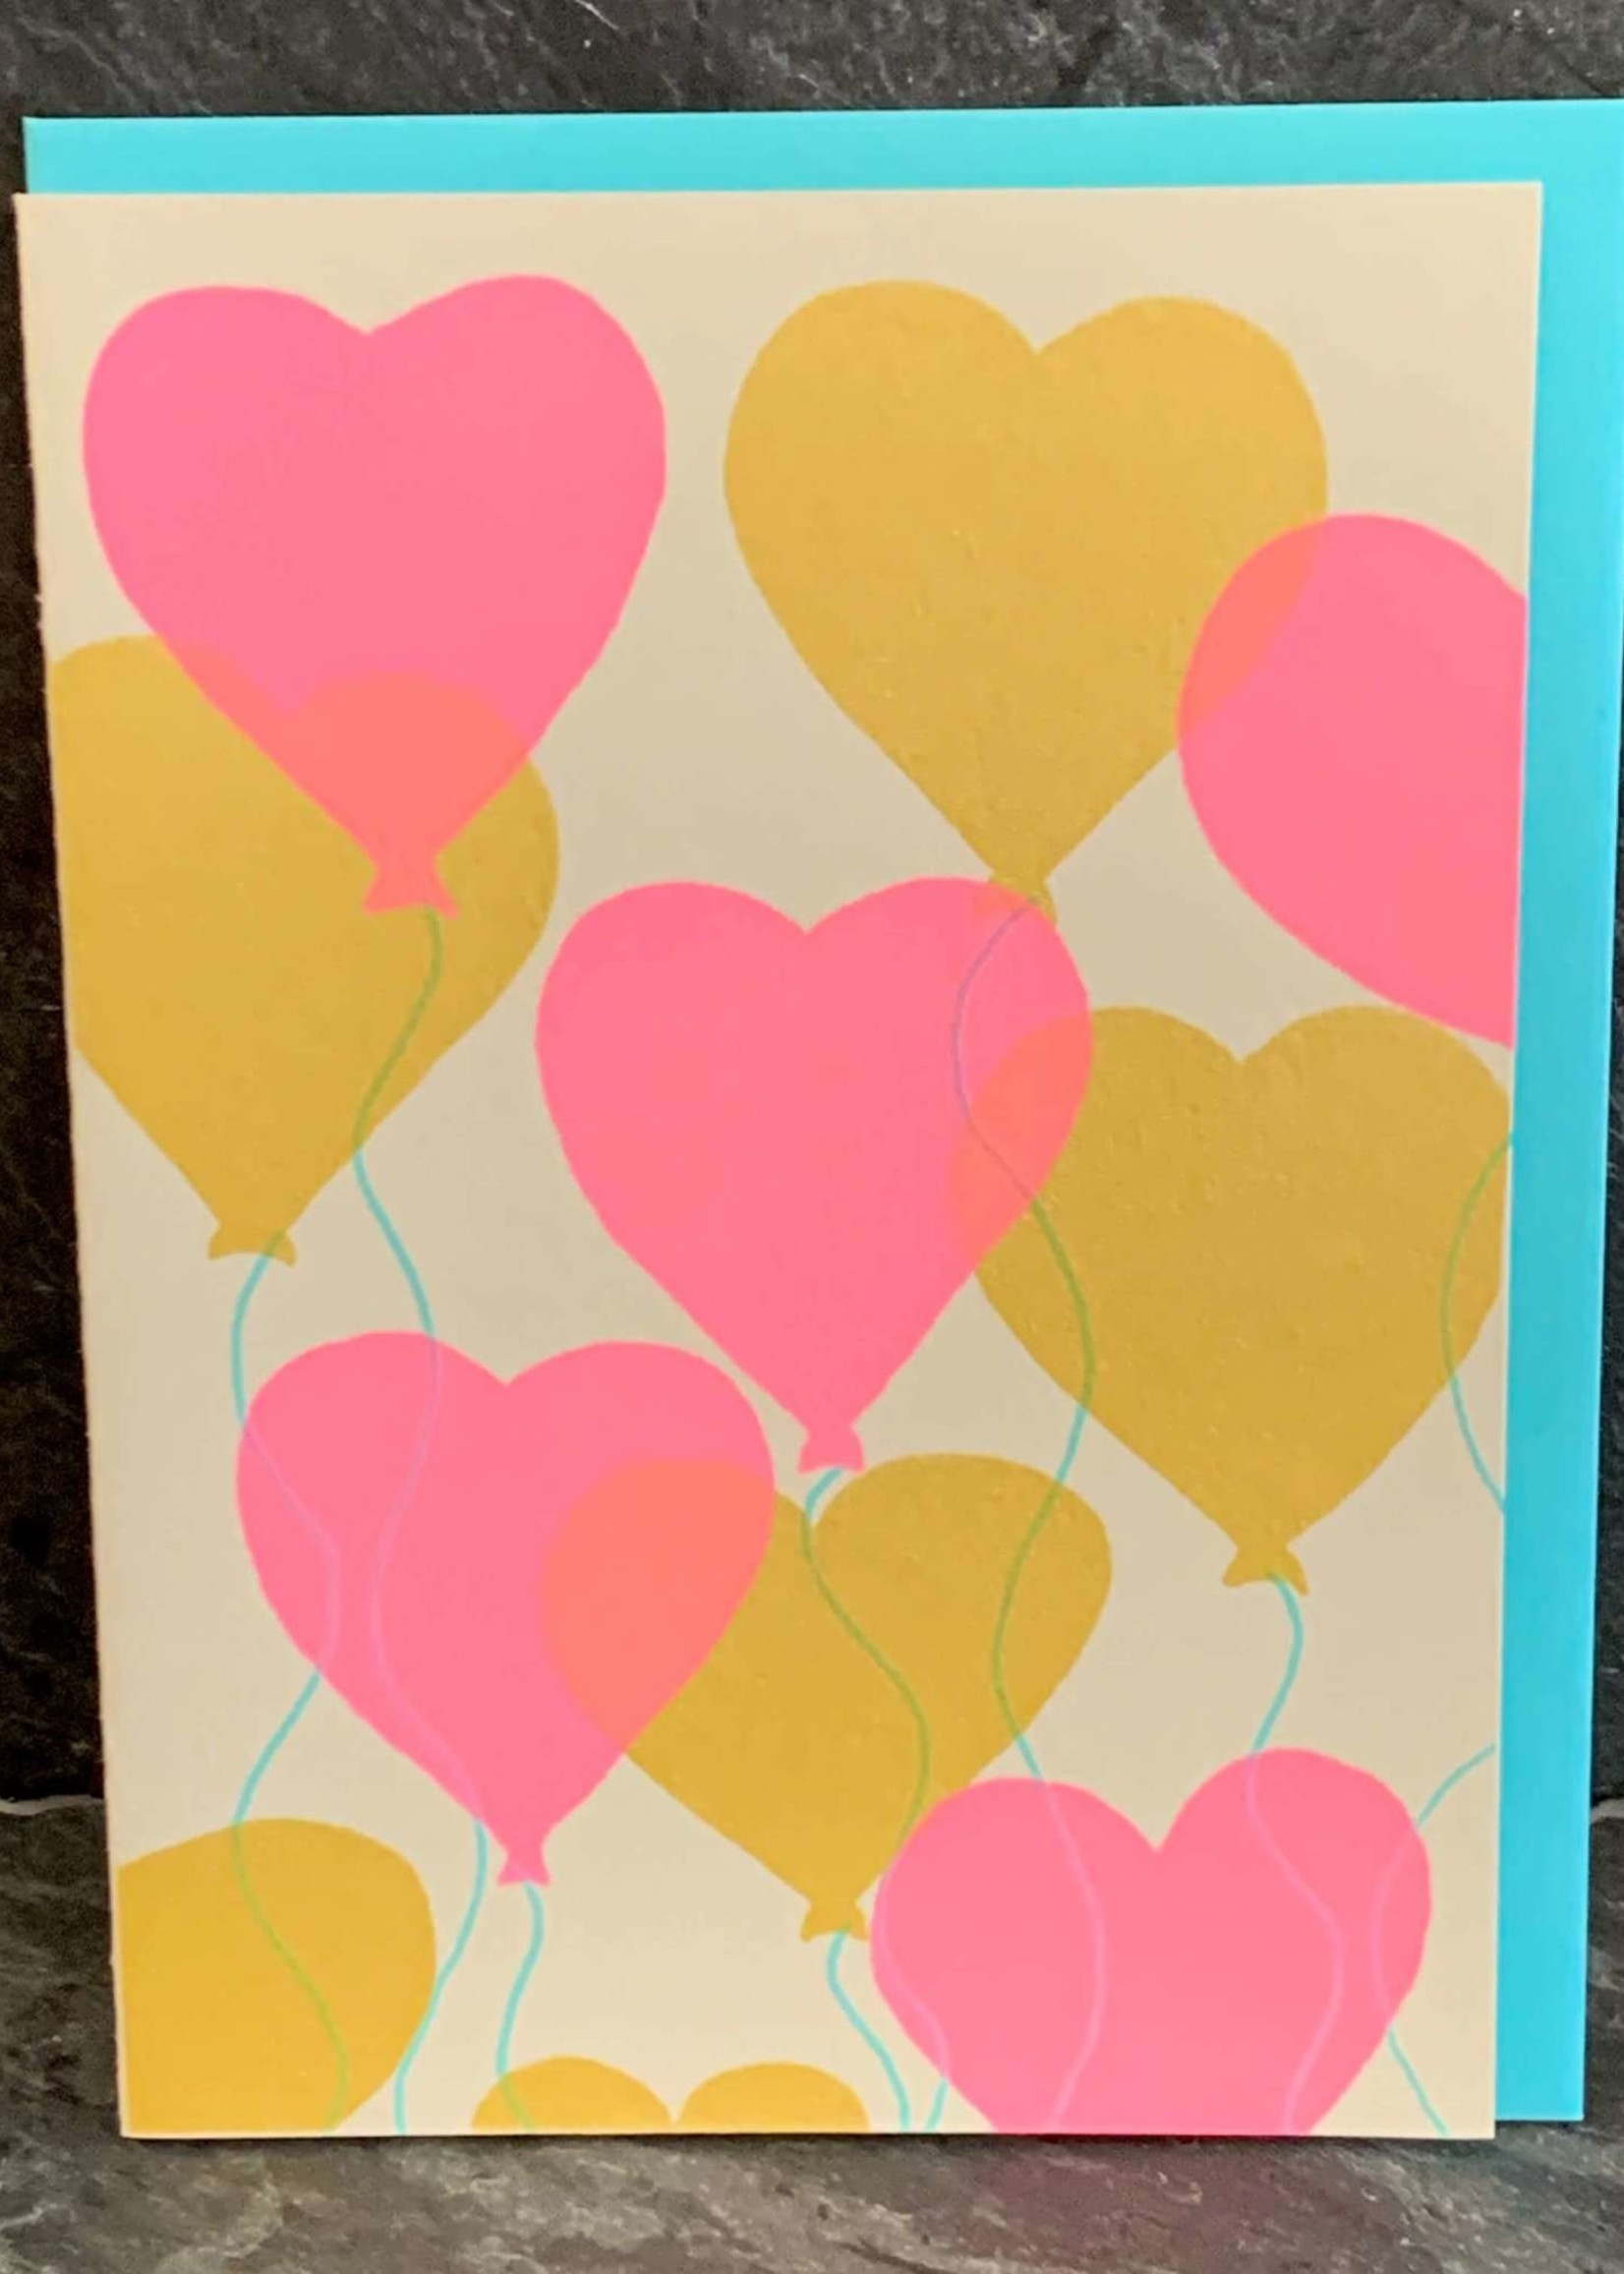 Gold Teeth Brooklyn Heart Balloons Anniversary/Love Card